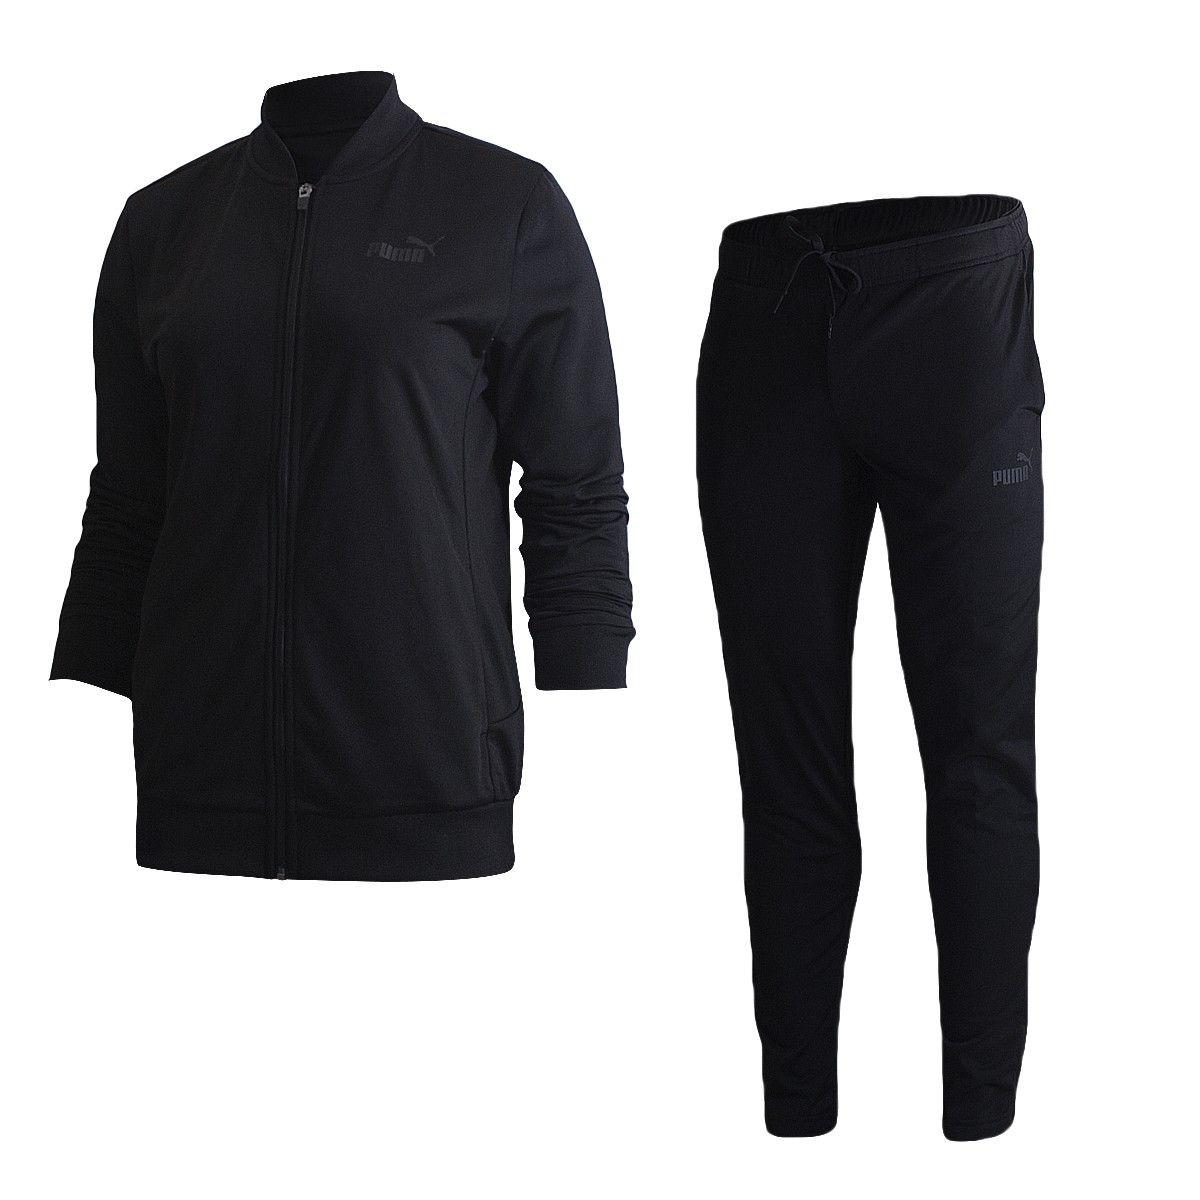 4f4e7baff2e Agasalho Puma Clean Tricot Suit